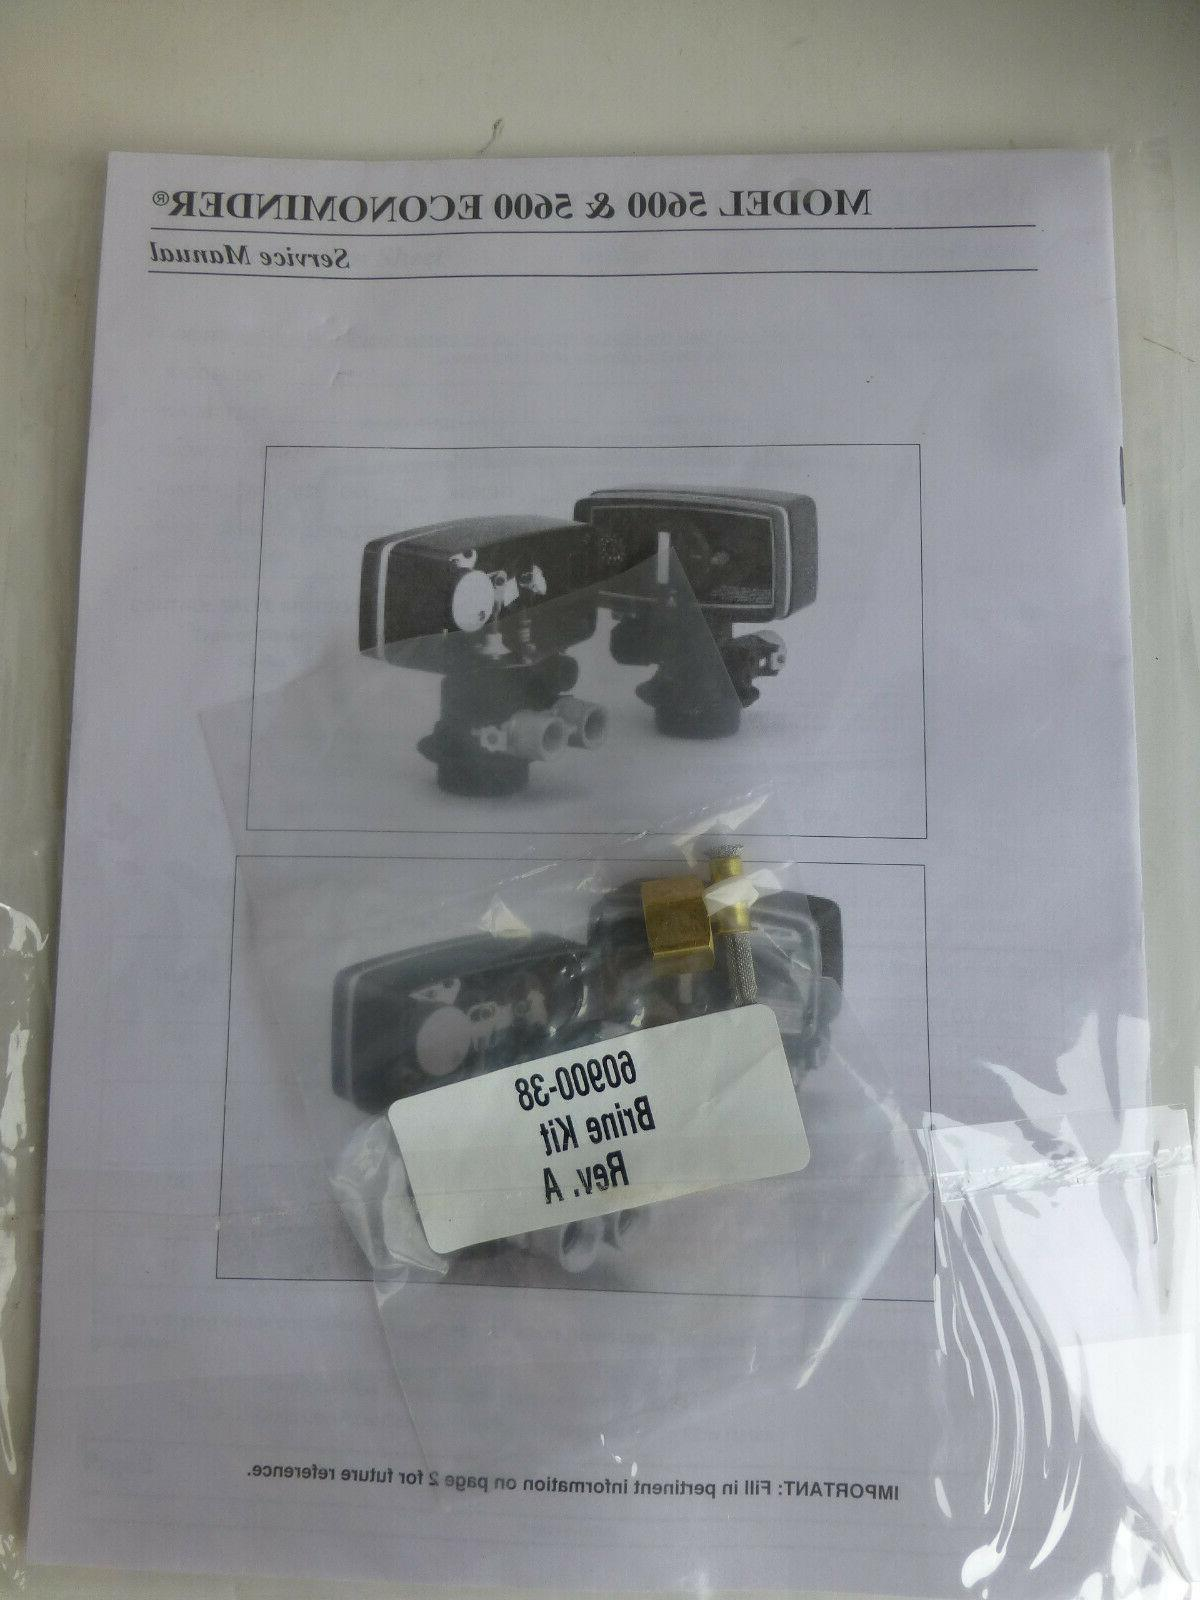 Model kit & service manual 60900-38